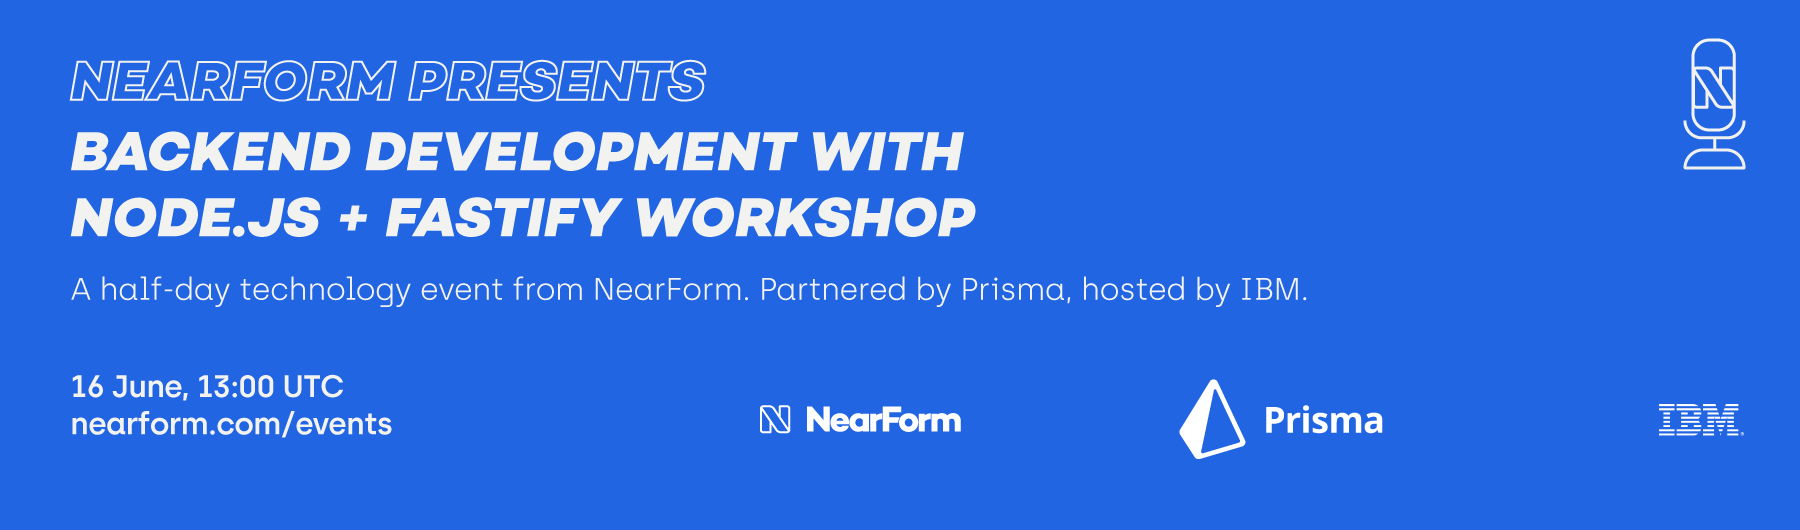 NearForm Presents Backend Development with Node.js